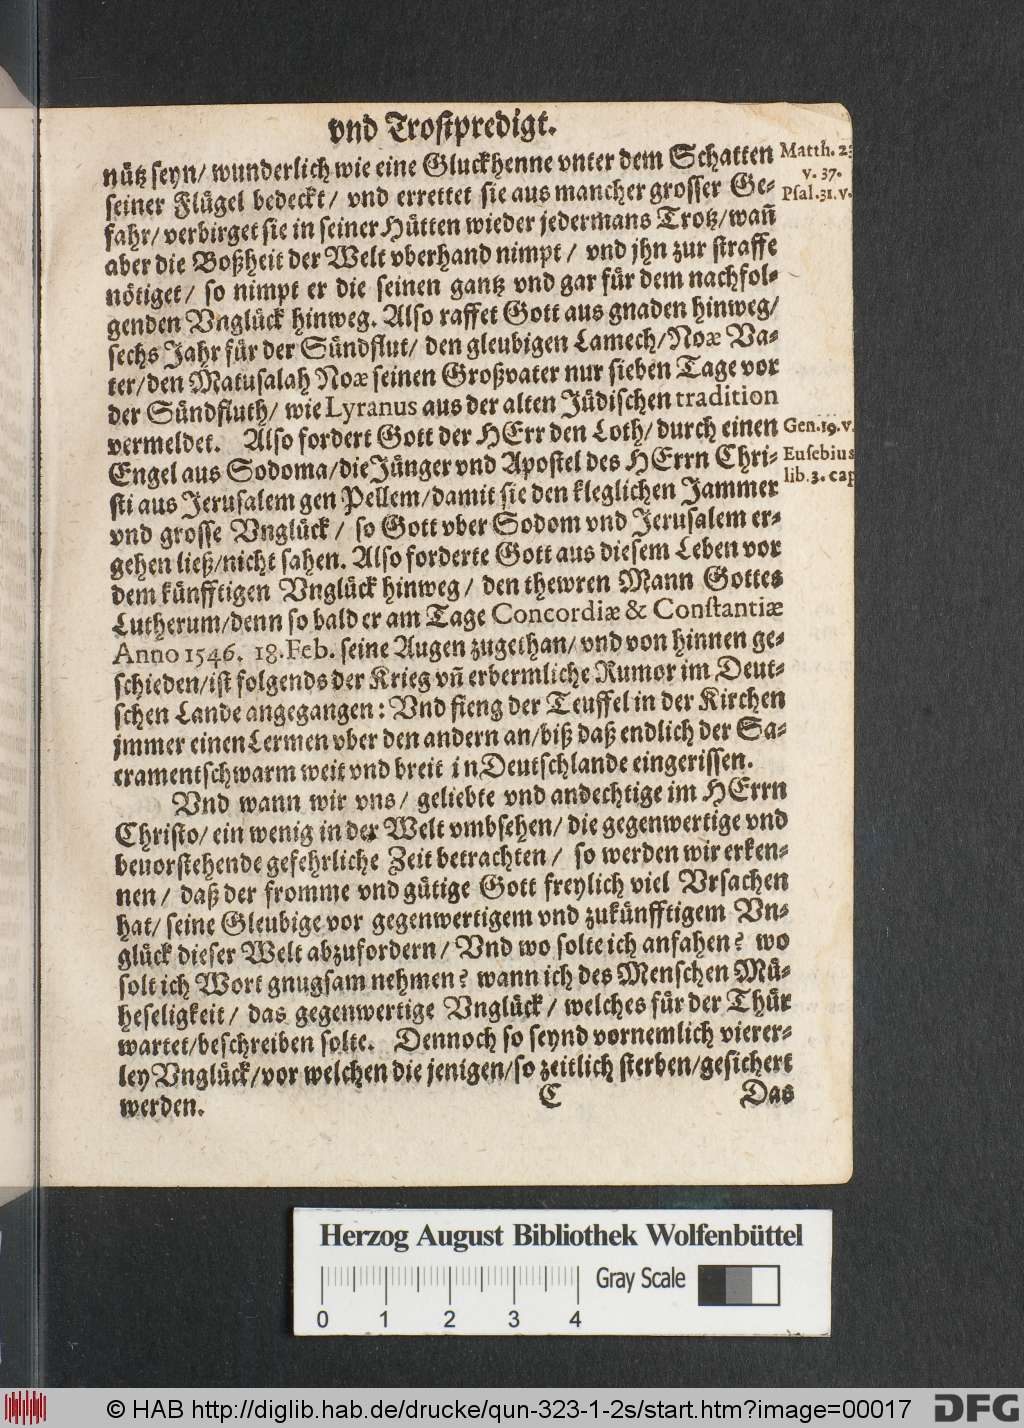 http://diglib.hab.de/drucke/qun-323-1-2s/00017.jpg